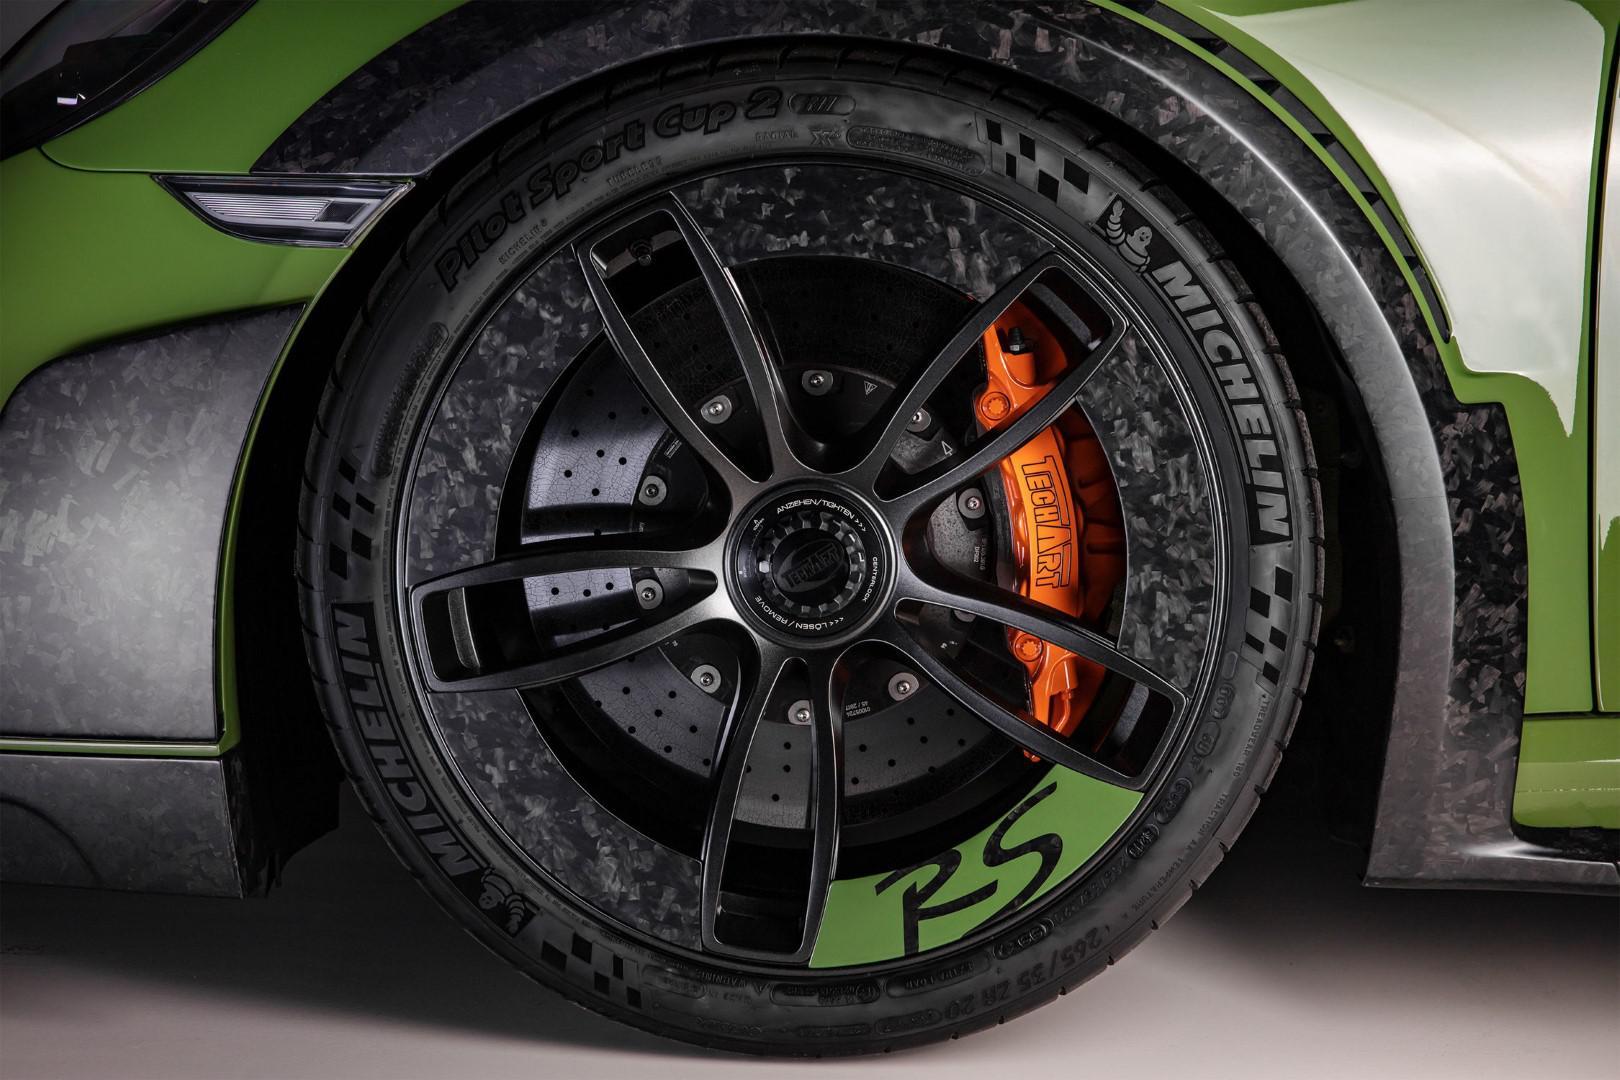 10-exemplaires-seulement-porsche-911-turbo-s-gtstreet-rs-by-techart-1049-8.jpg